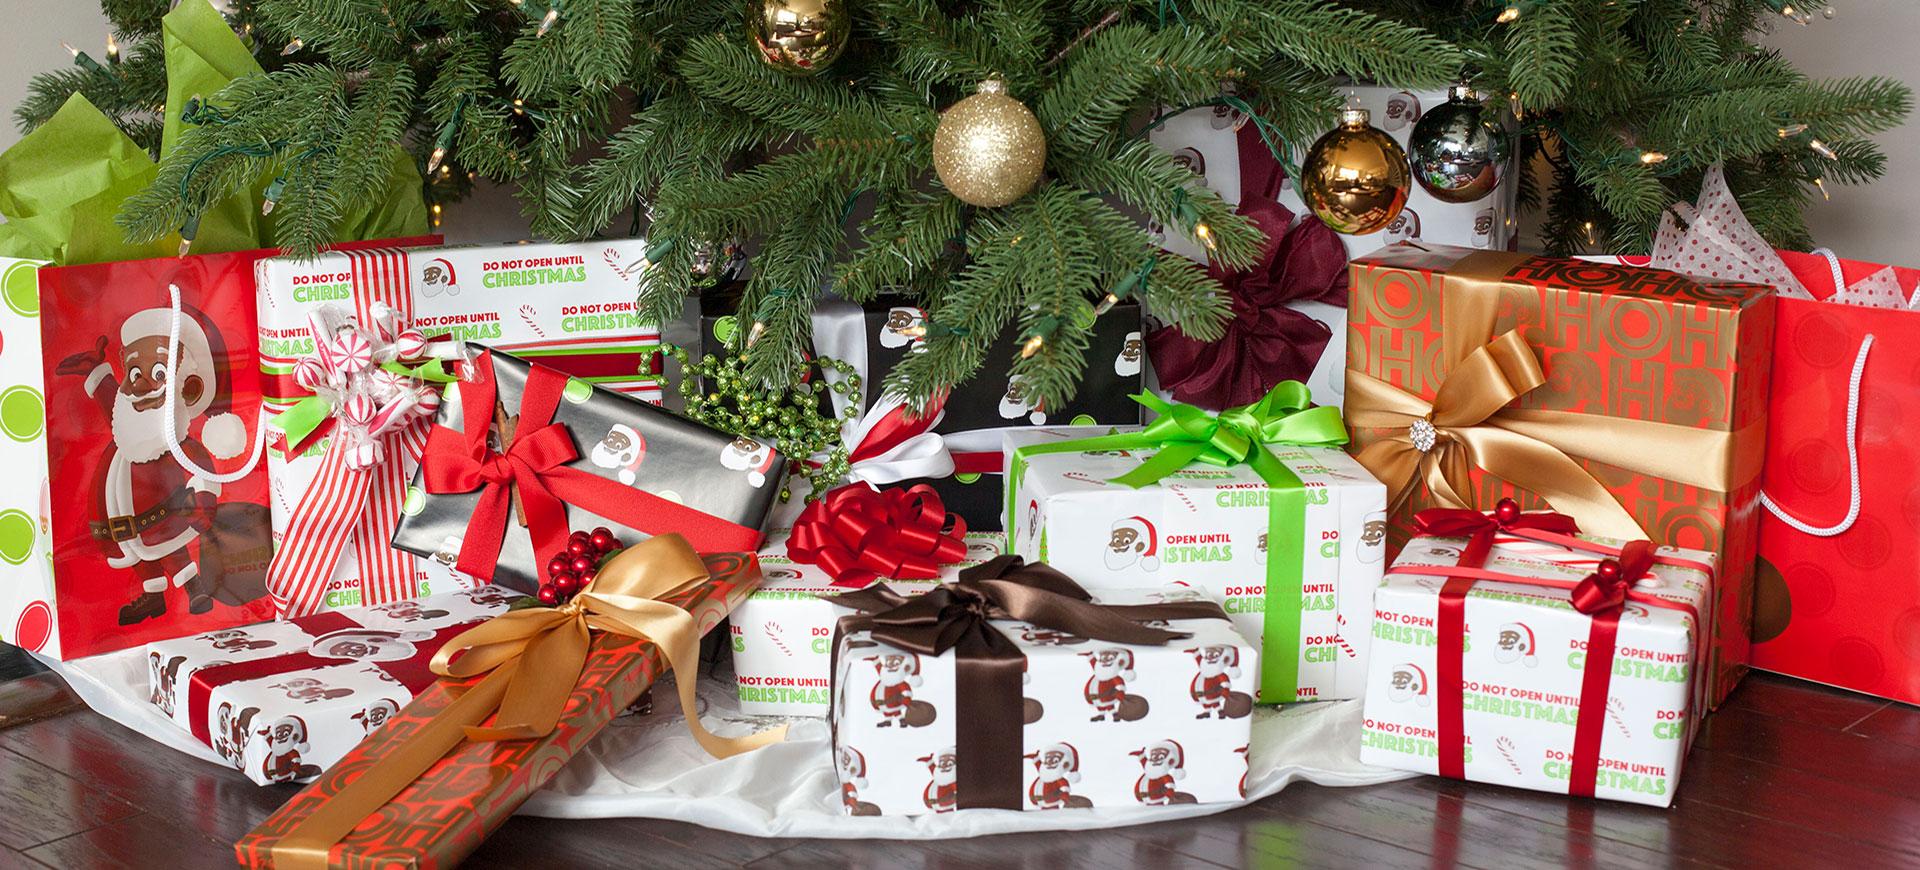 Greentop Gifts